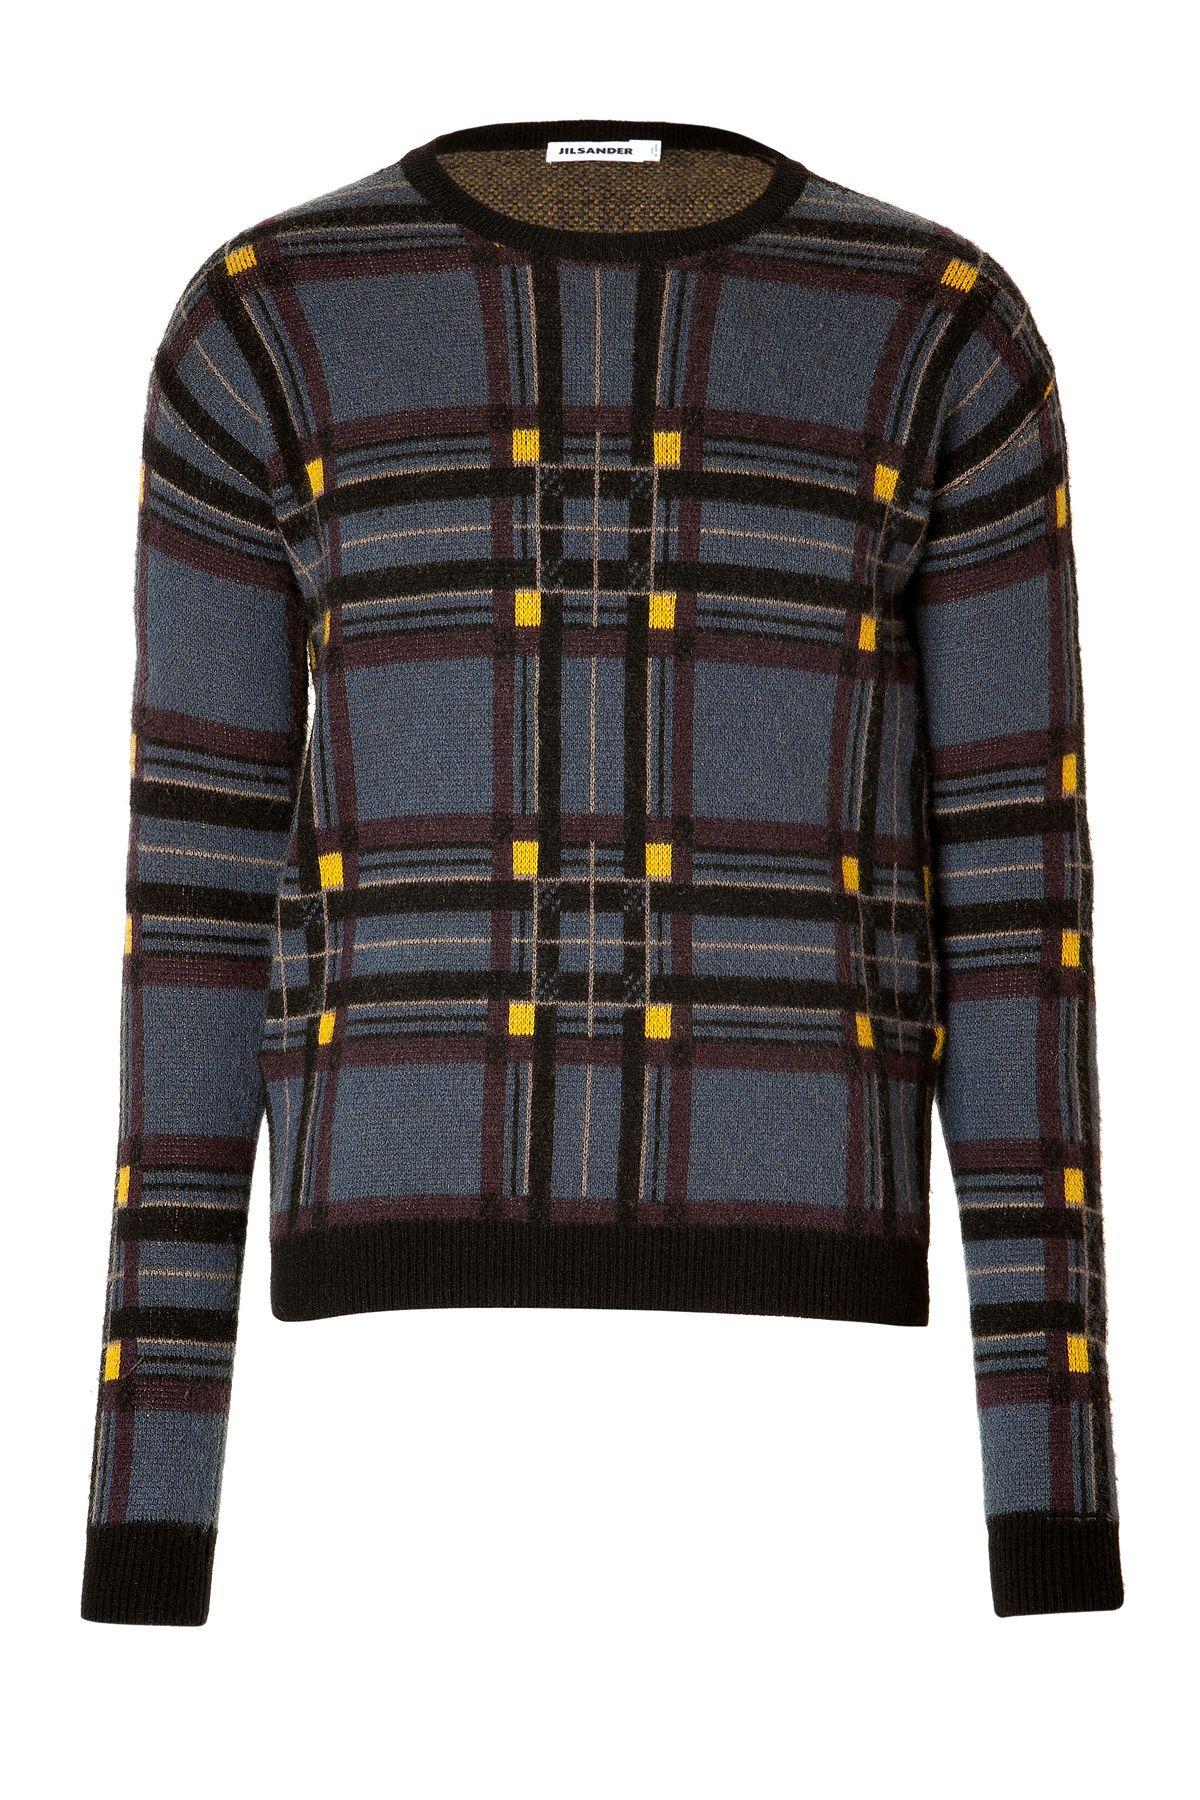 CashmereSweater byJILSANDER | STYLEBOP.com